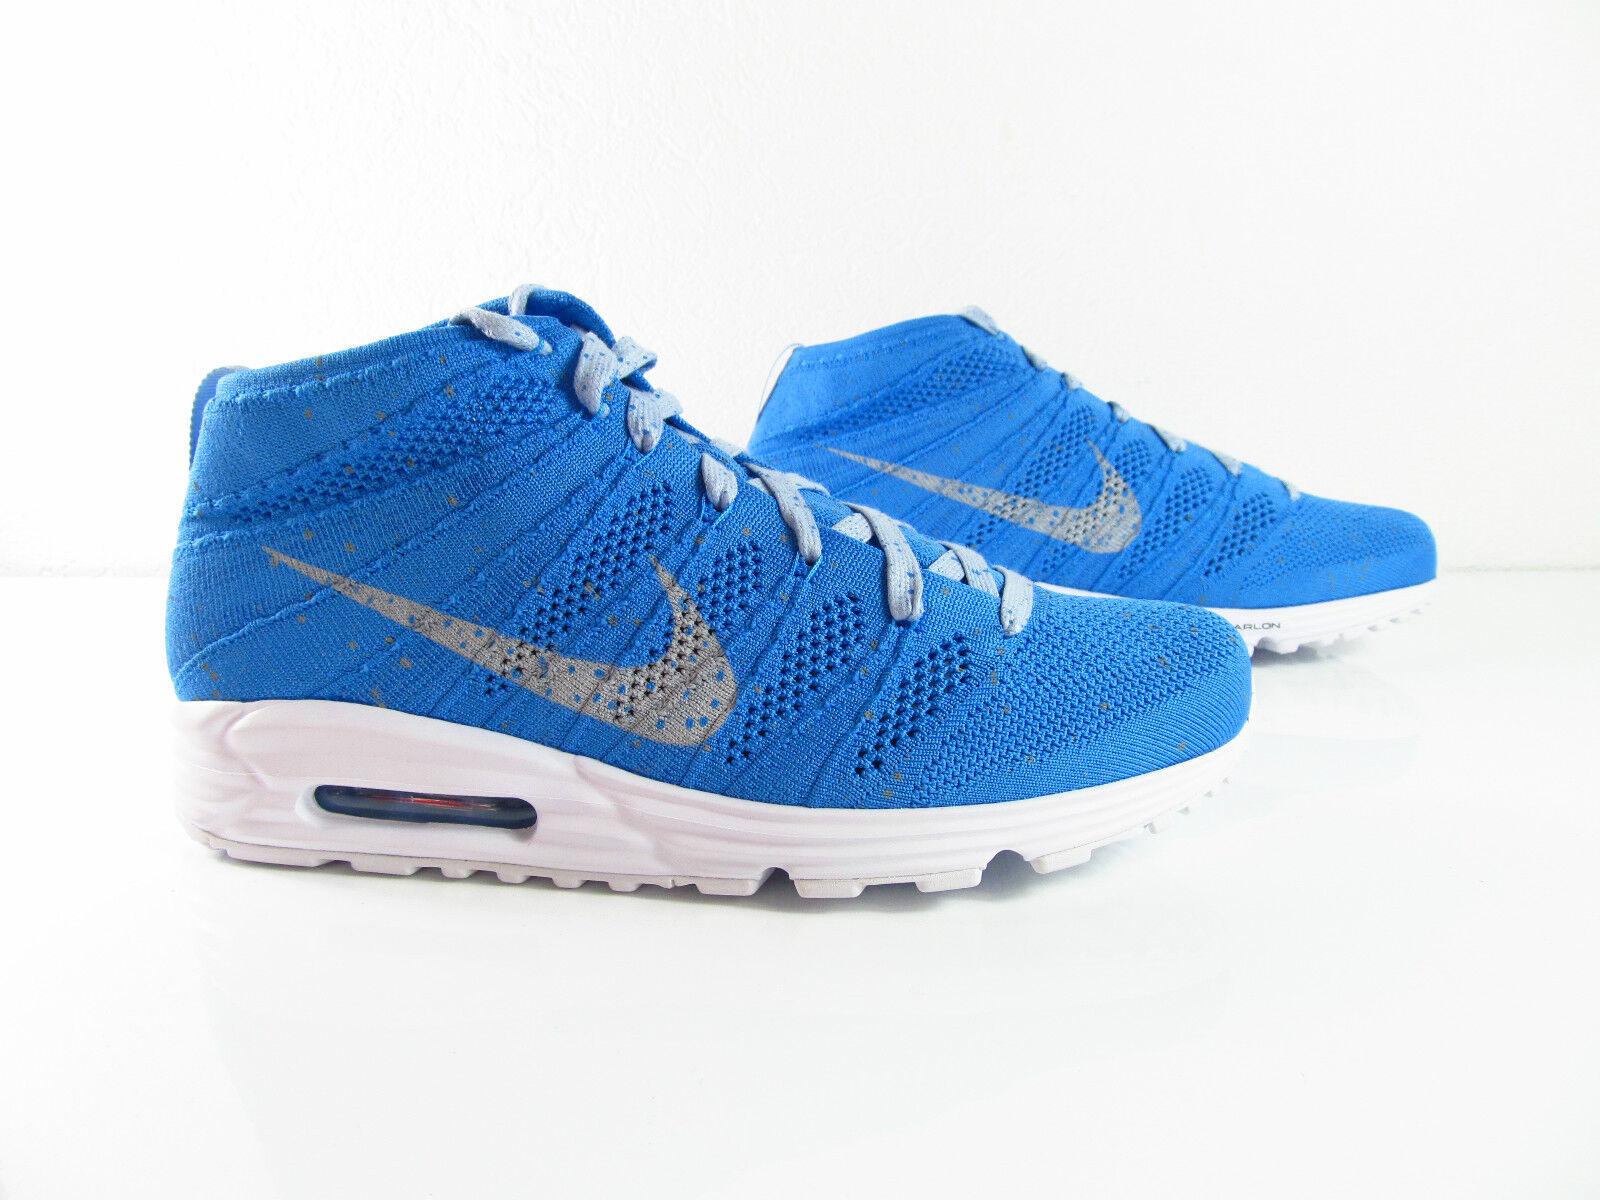 Nike lunarmax flyknit chka - chukka sp leuchten blau lunarlon us_9.5 us_9.5 lunarlon eur_43 arsenal c49163